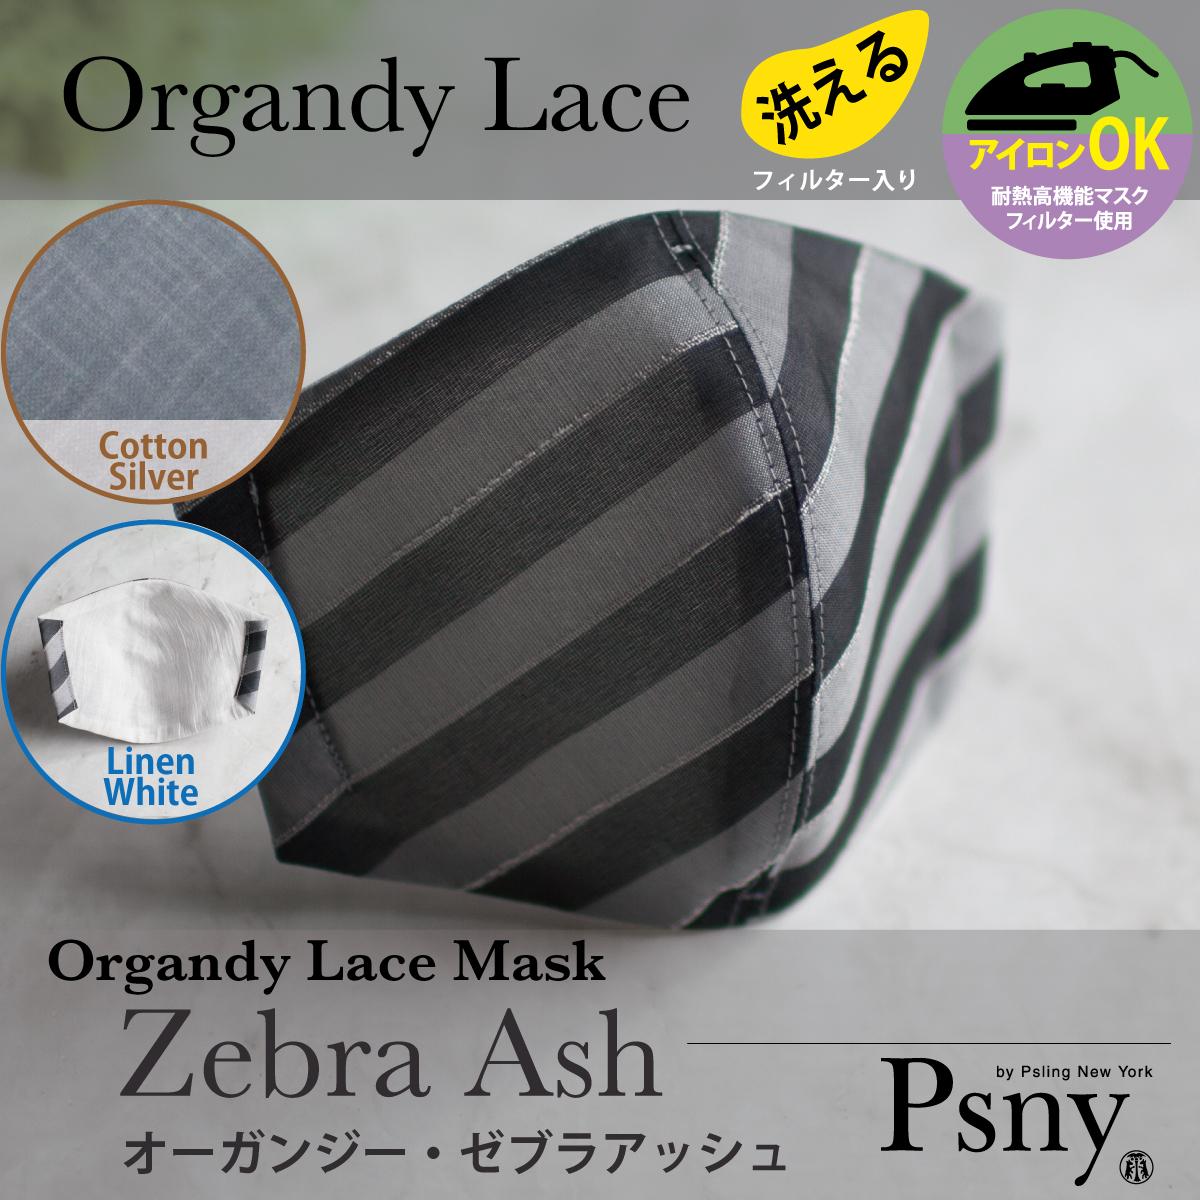 PSNY オーガンジー・ゼブラ・アッシュ 花粉 黄砂 洗えるフィルター入り 立体 マスク 大人用 送料無料